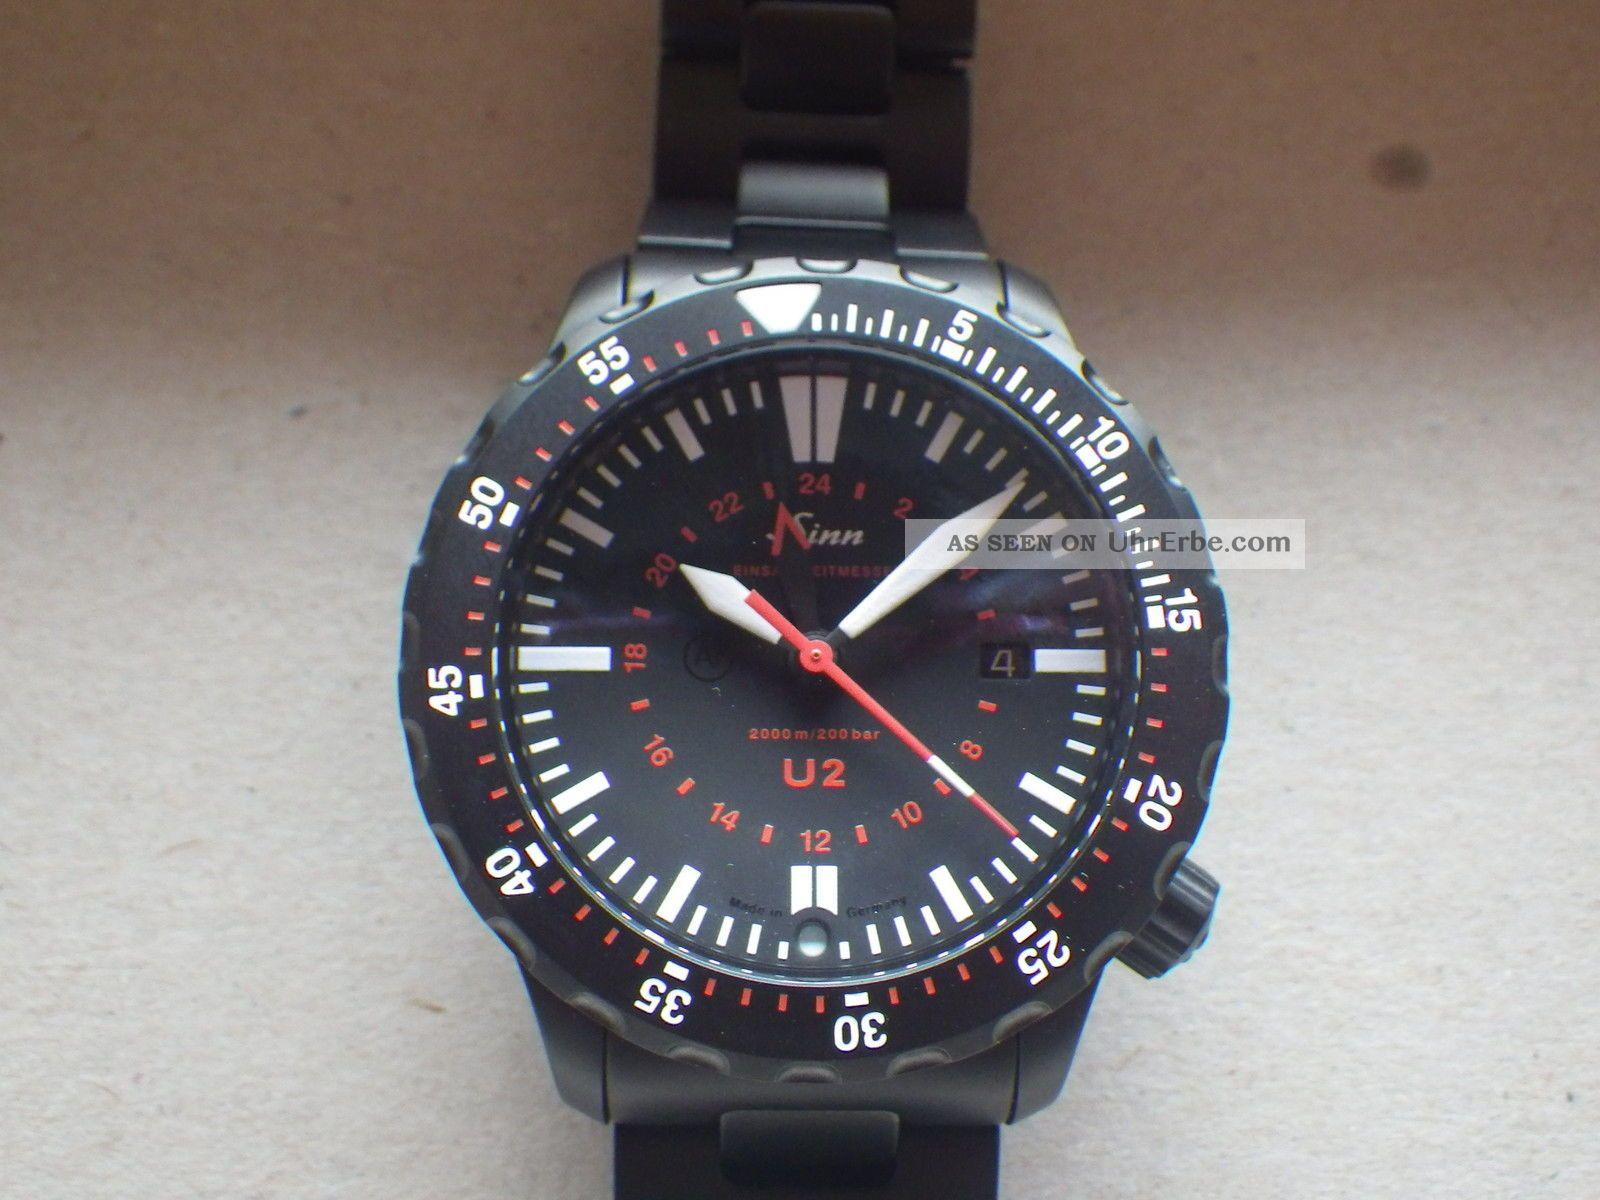 Sinn U2 S Aus U - Bootstahl Ungetragen Top Armbanduhren Bild